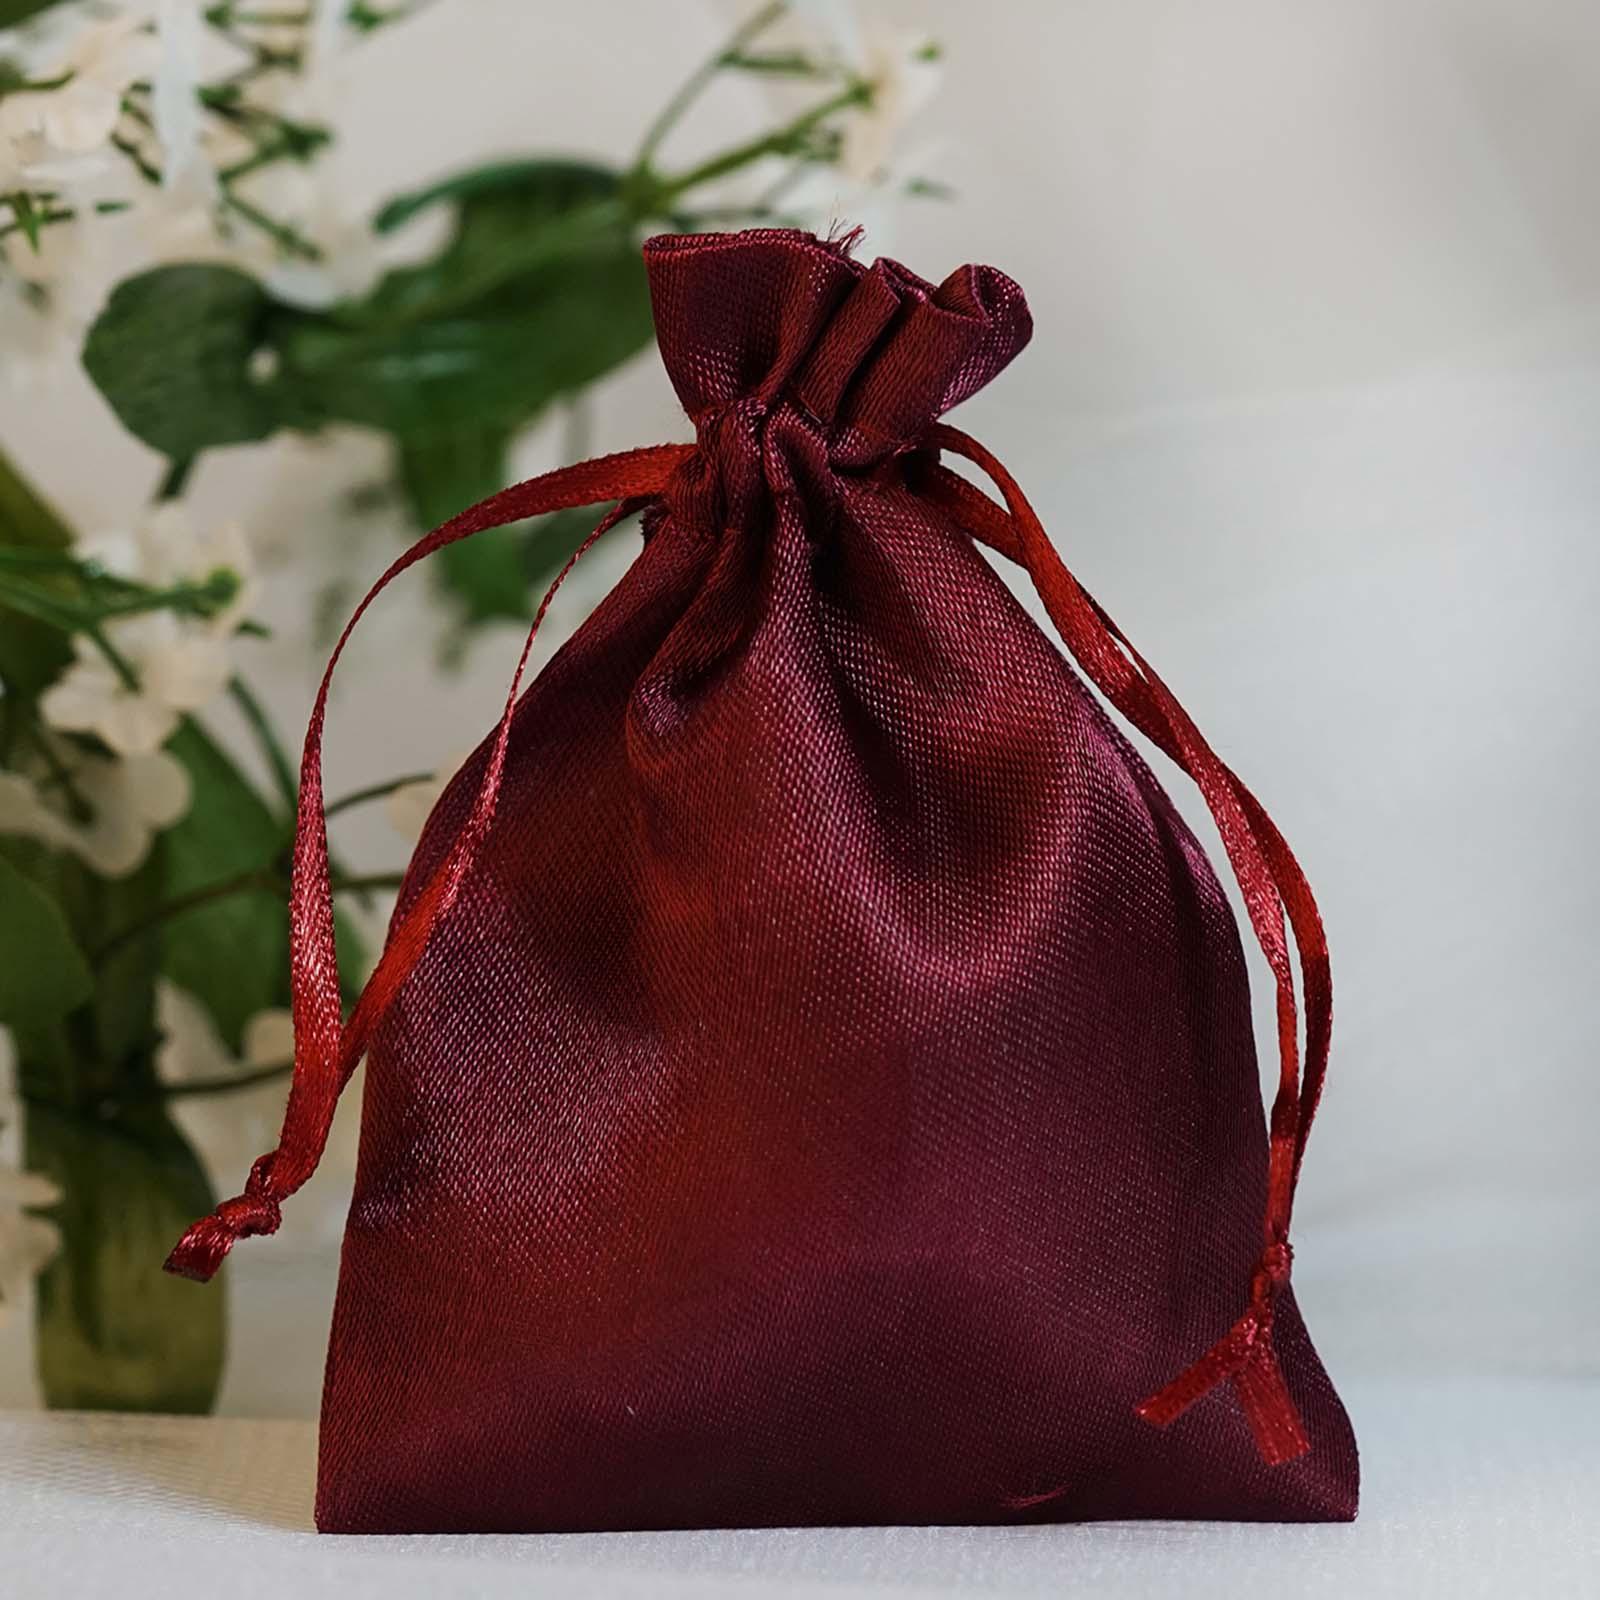 Wedding Gift Pouches: 240 Pcs 3x3.5 Inch SATIN Drawstring FAVOR BAGS